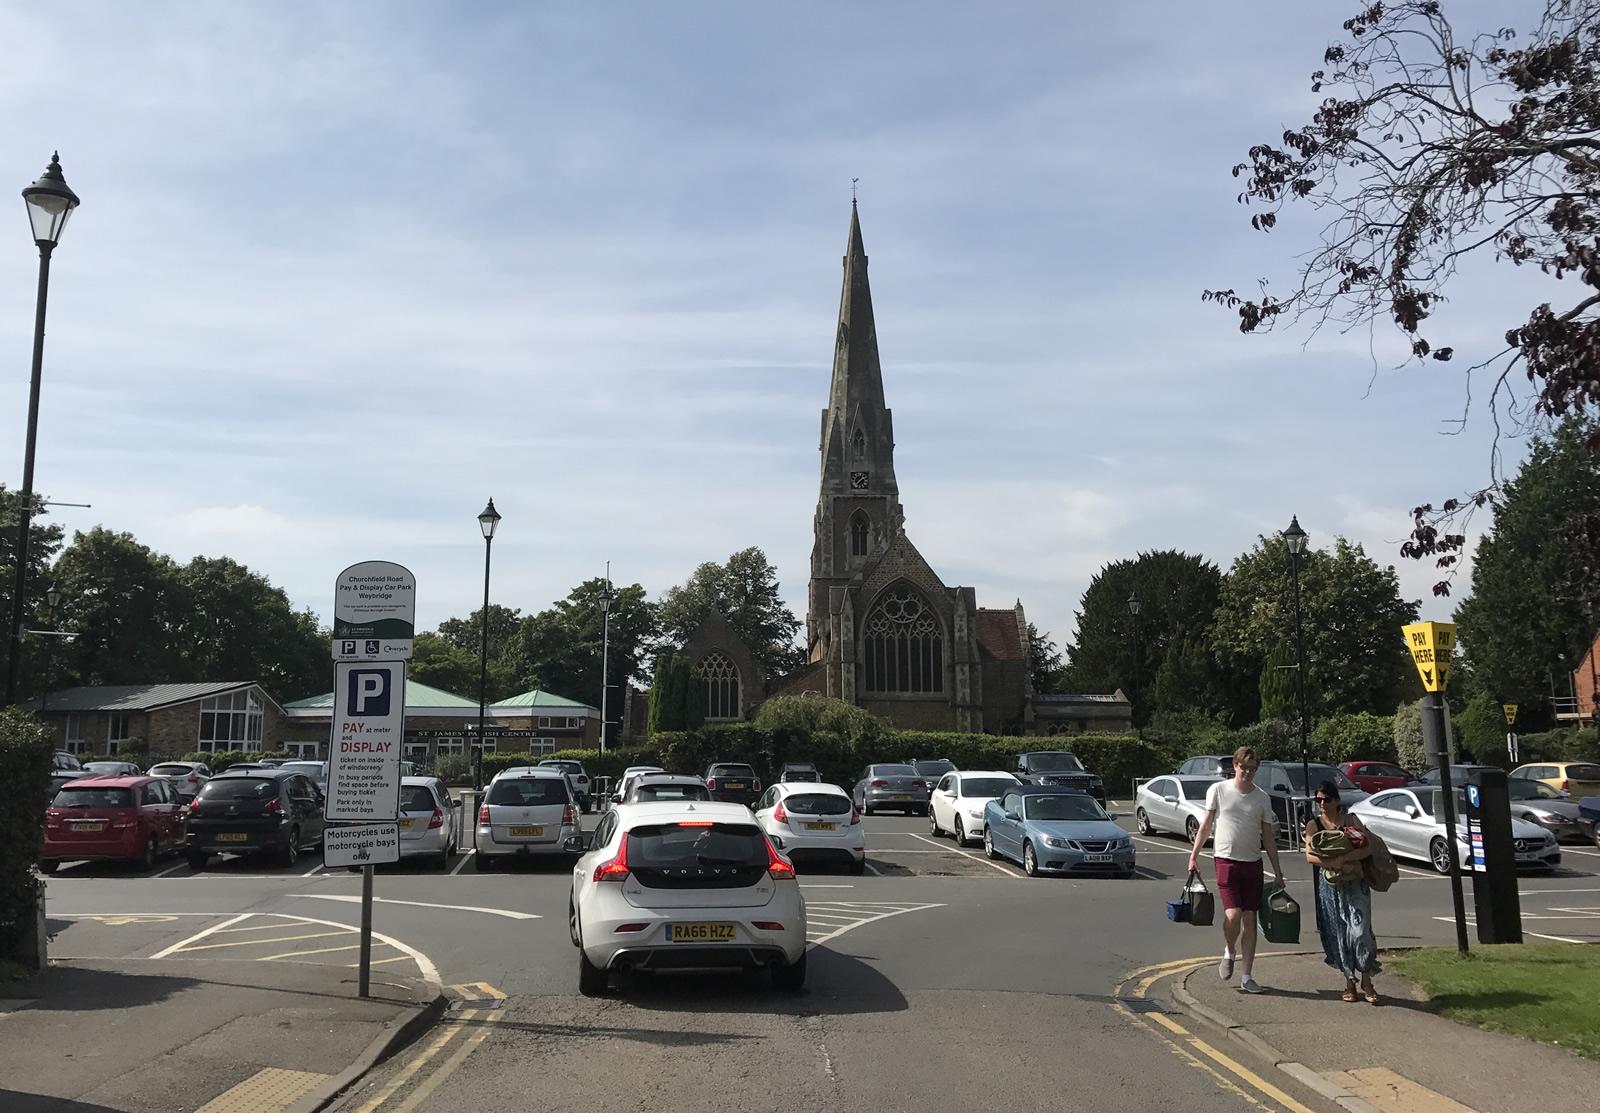 One Public Estate Feasibility - Weybridge Library